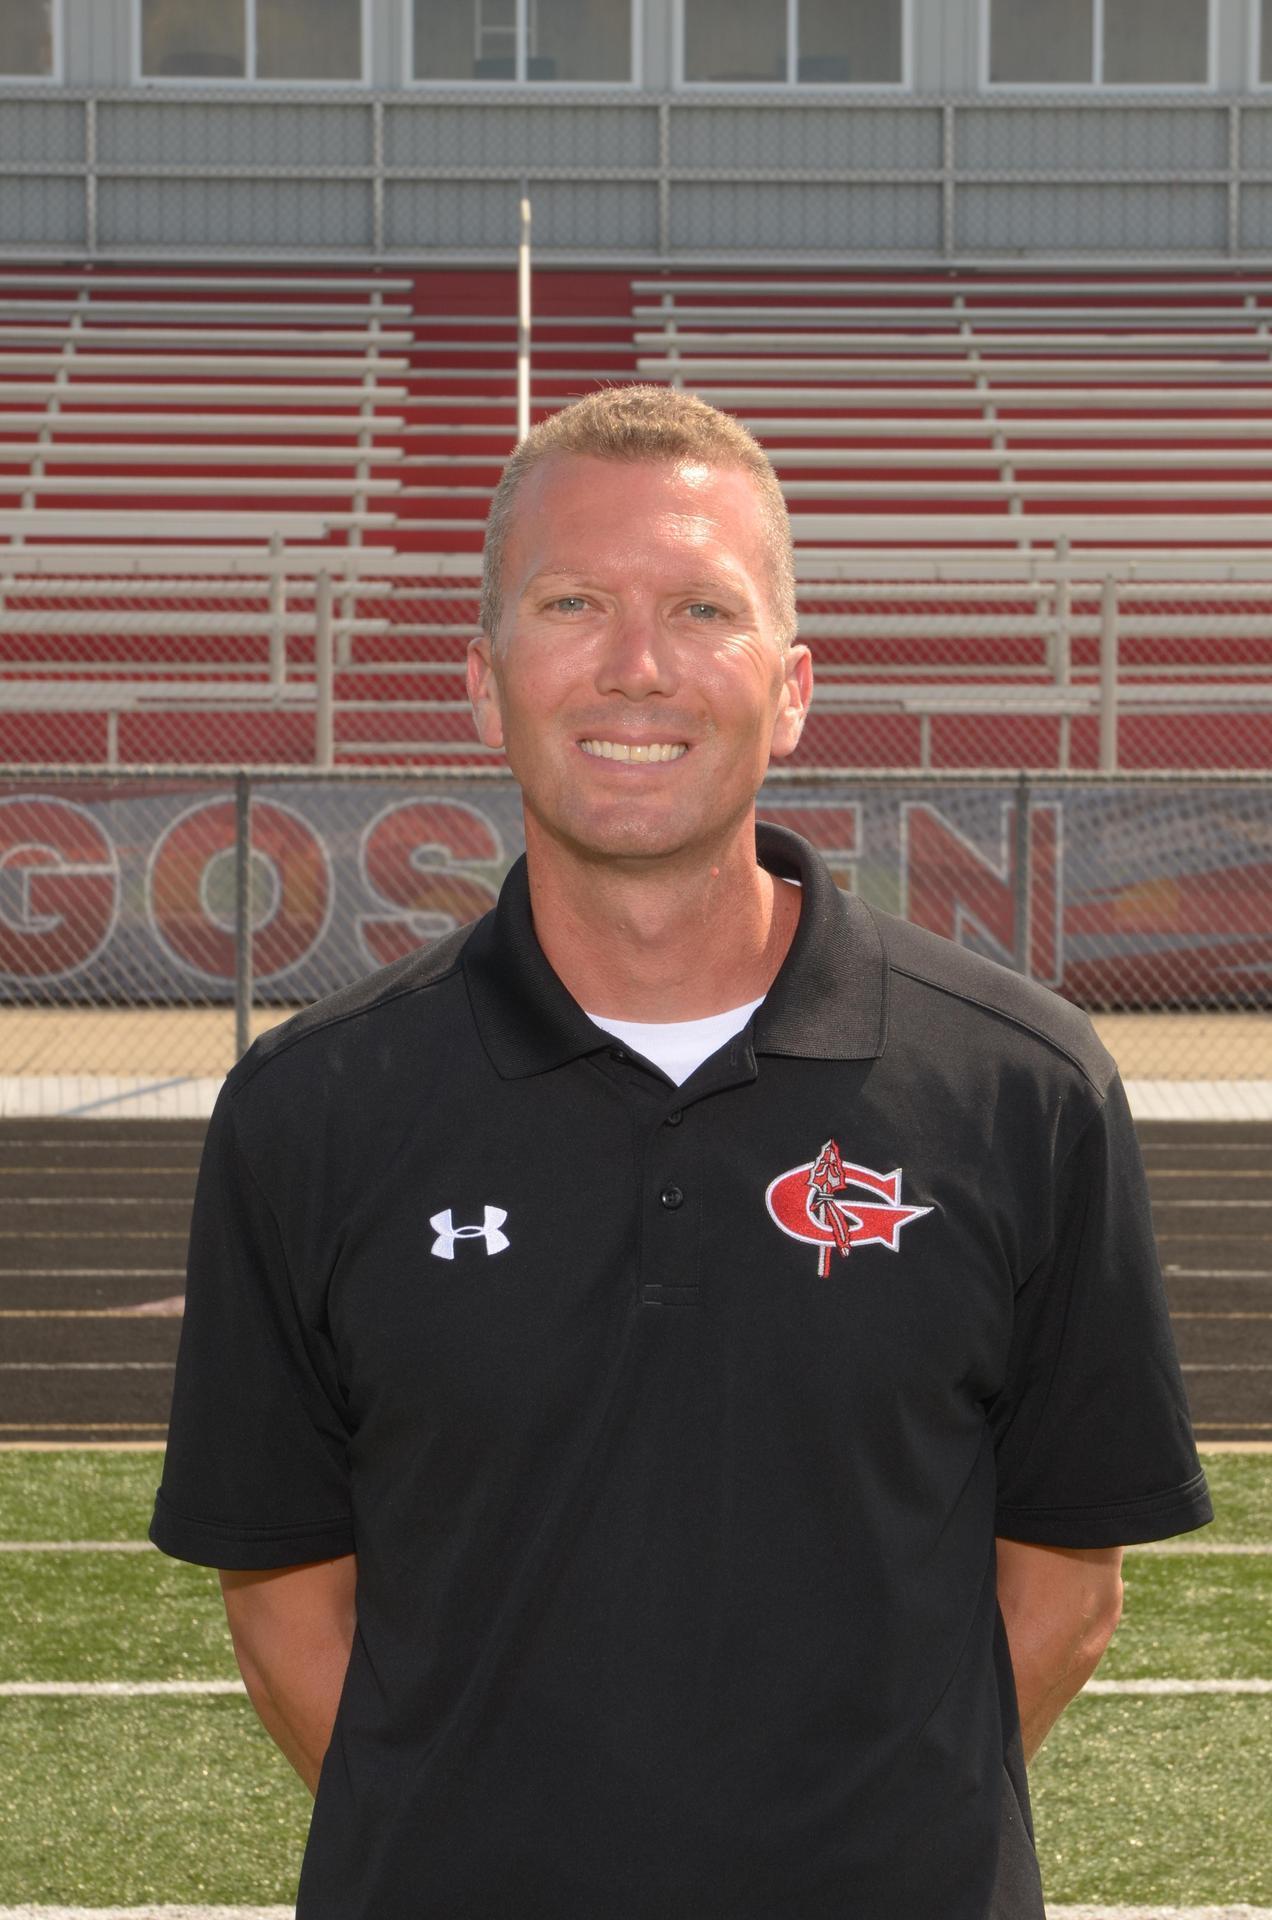 Coach Buechner